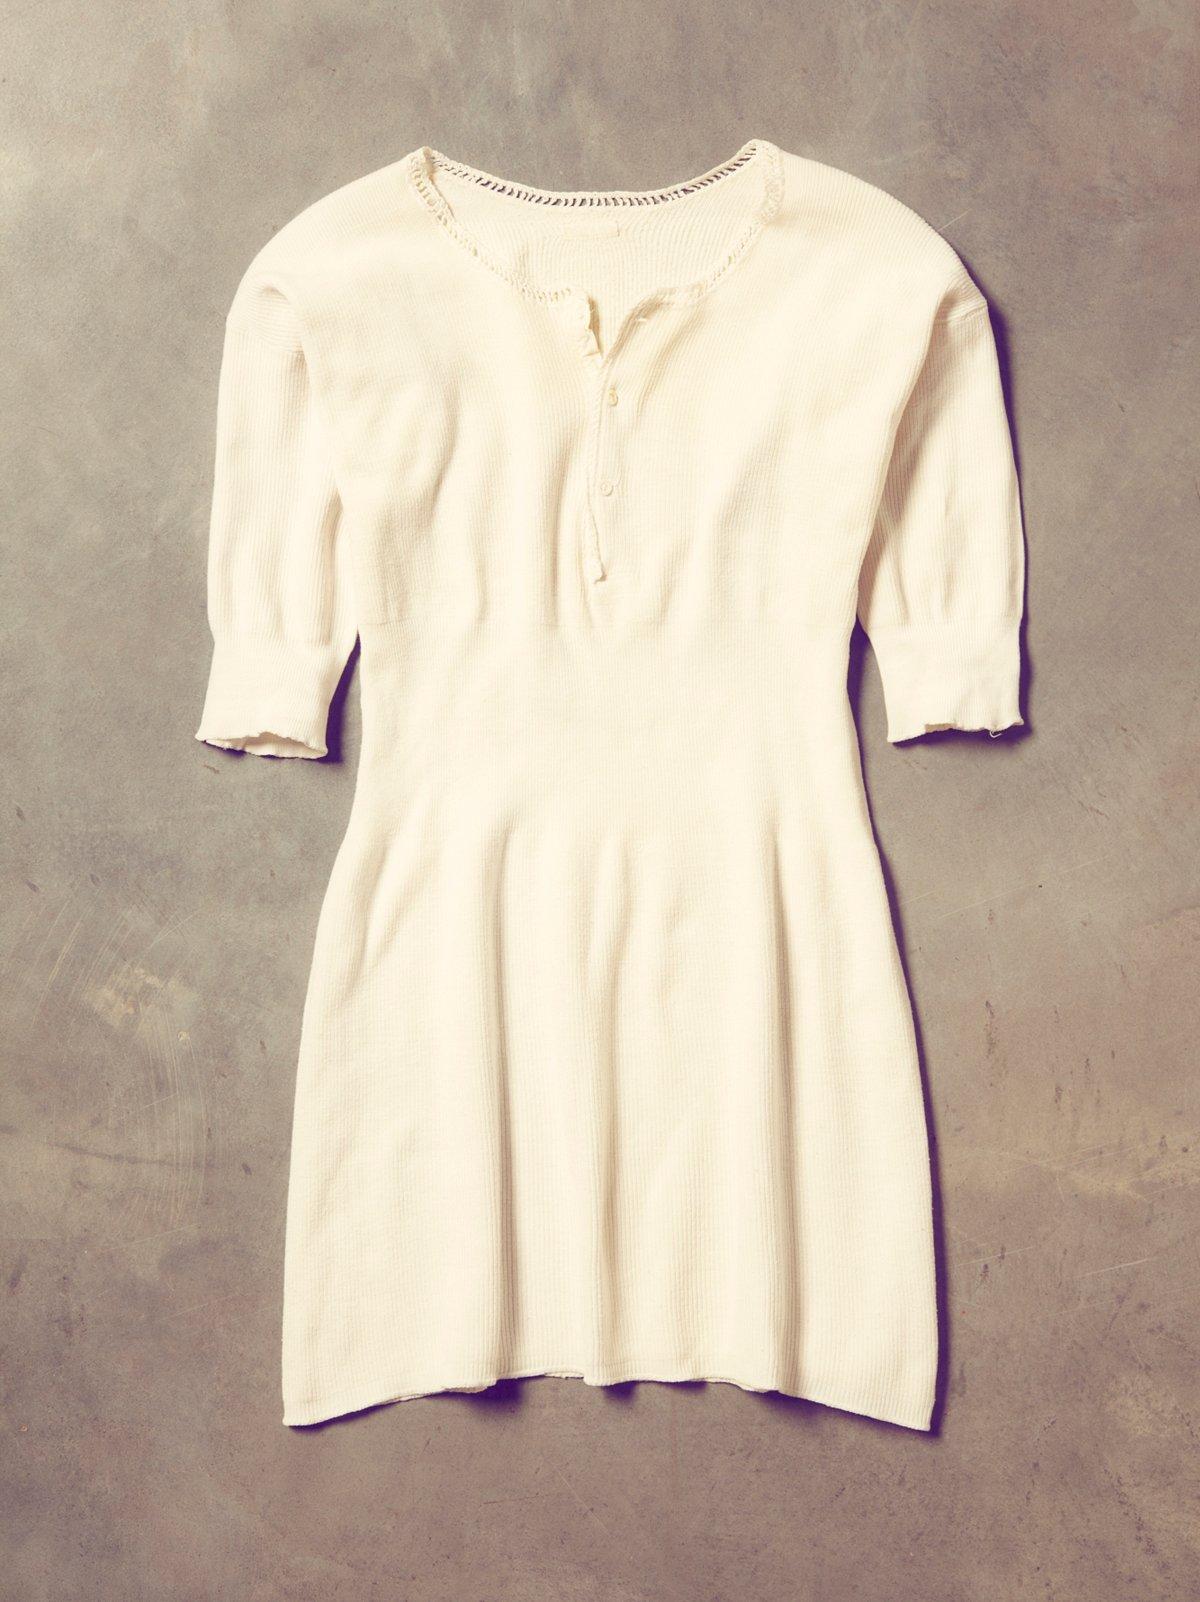 Vintage Knit Undershirt